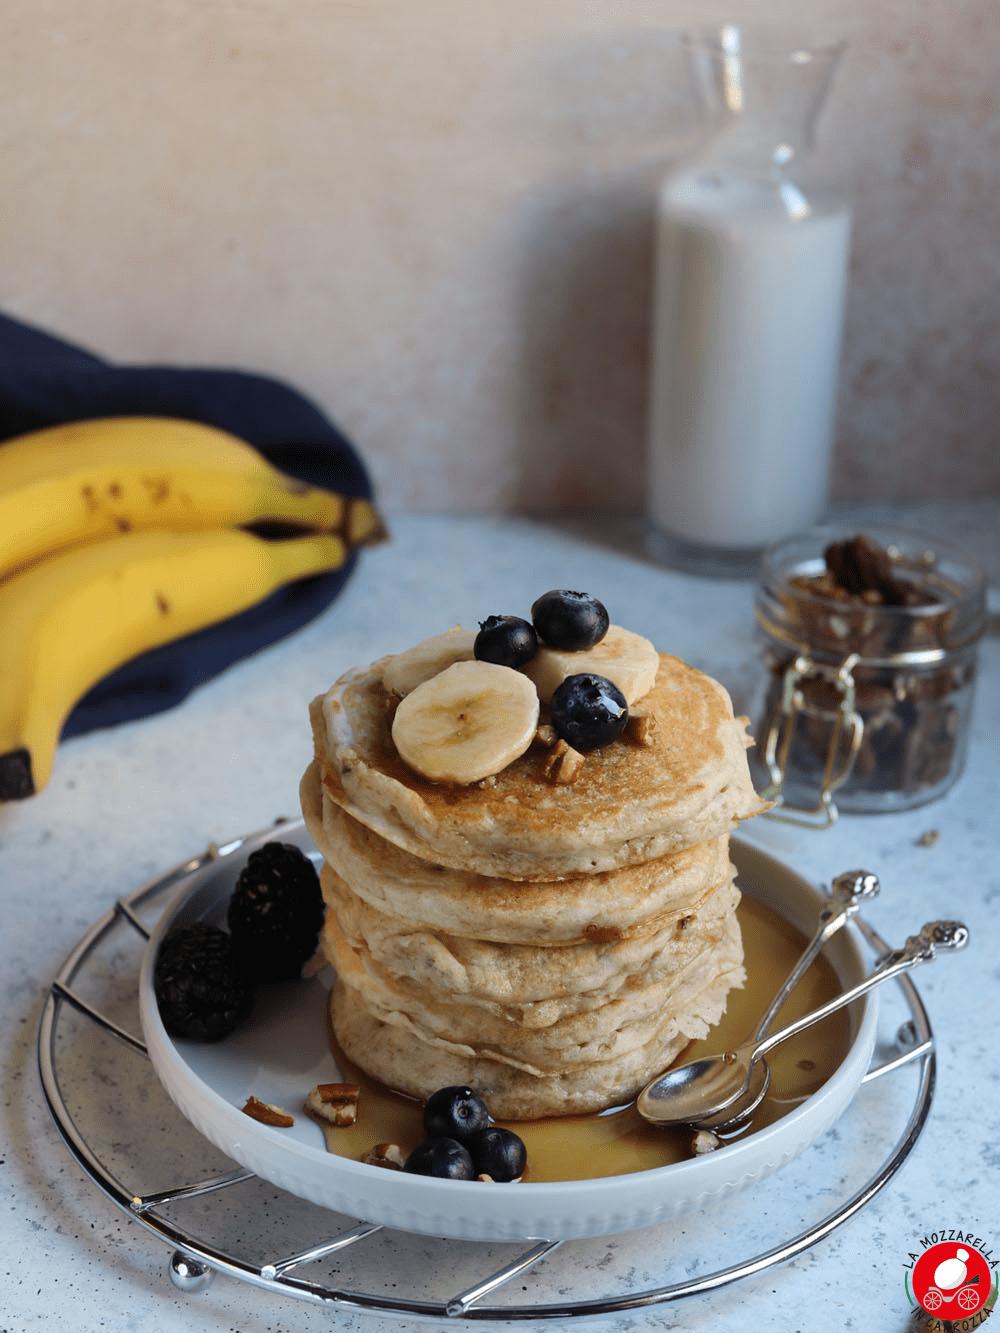 La Mozzarella in Carrozza - Banana pancakes